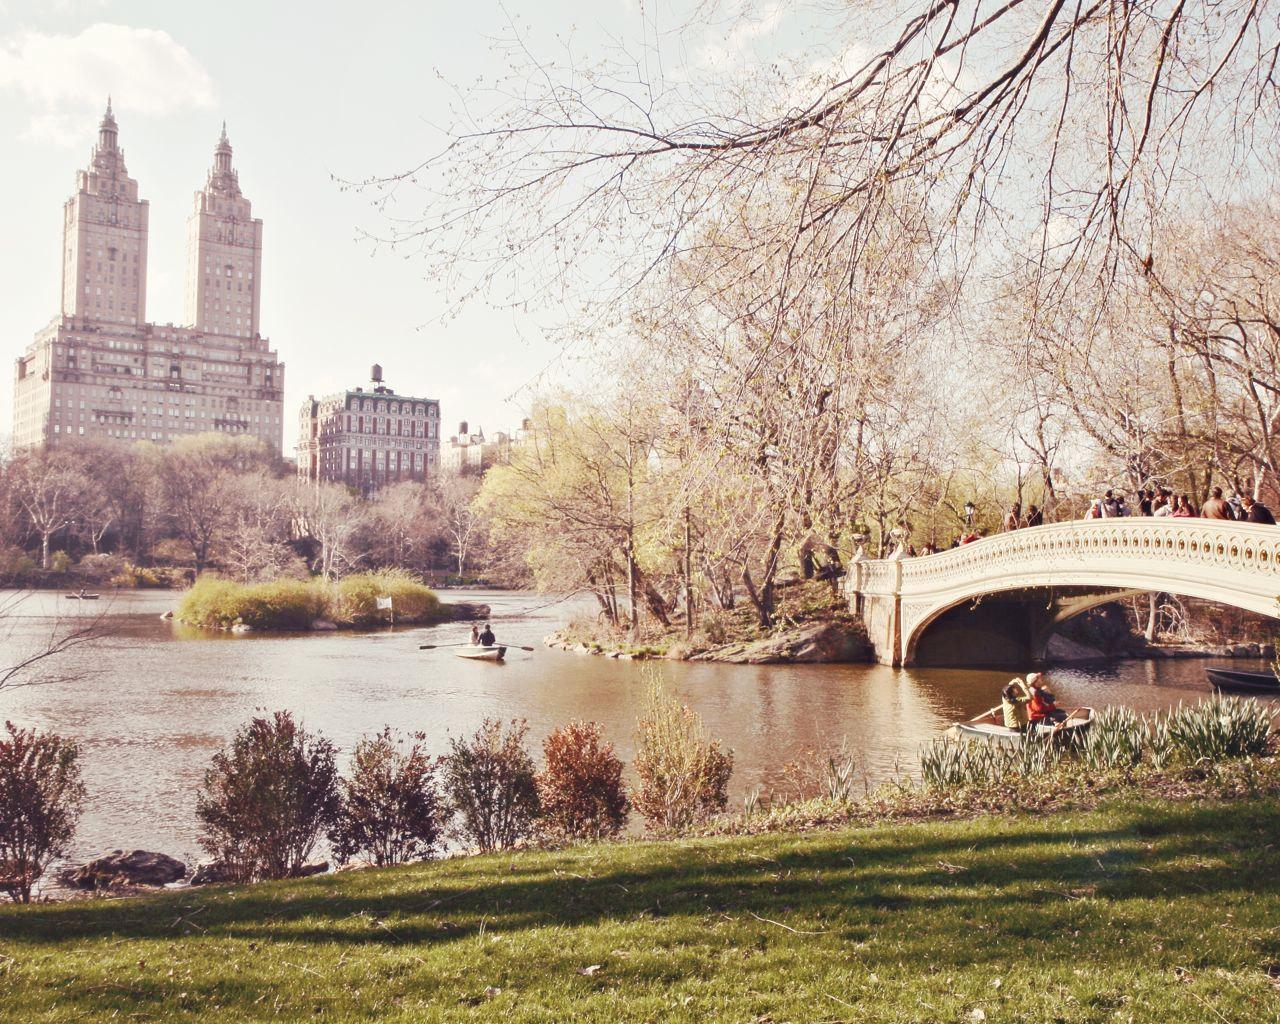 New York City Bow Bridge In Central Park New York City Photos New York City City Photo